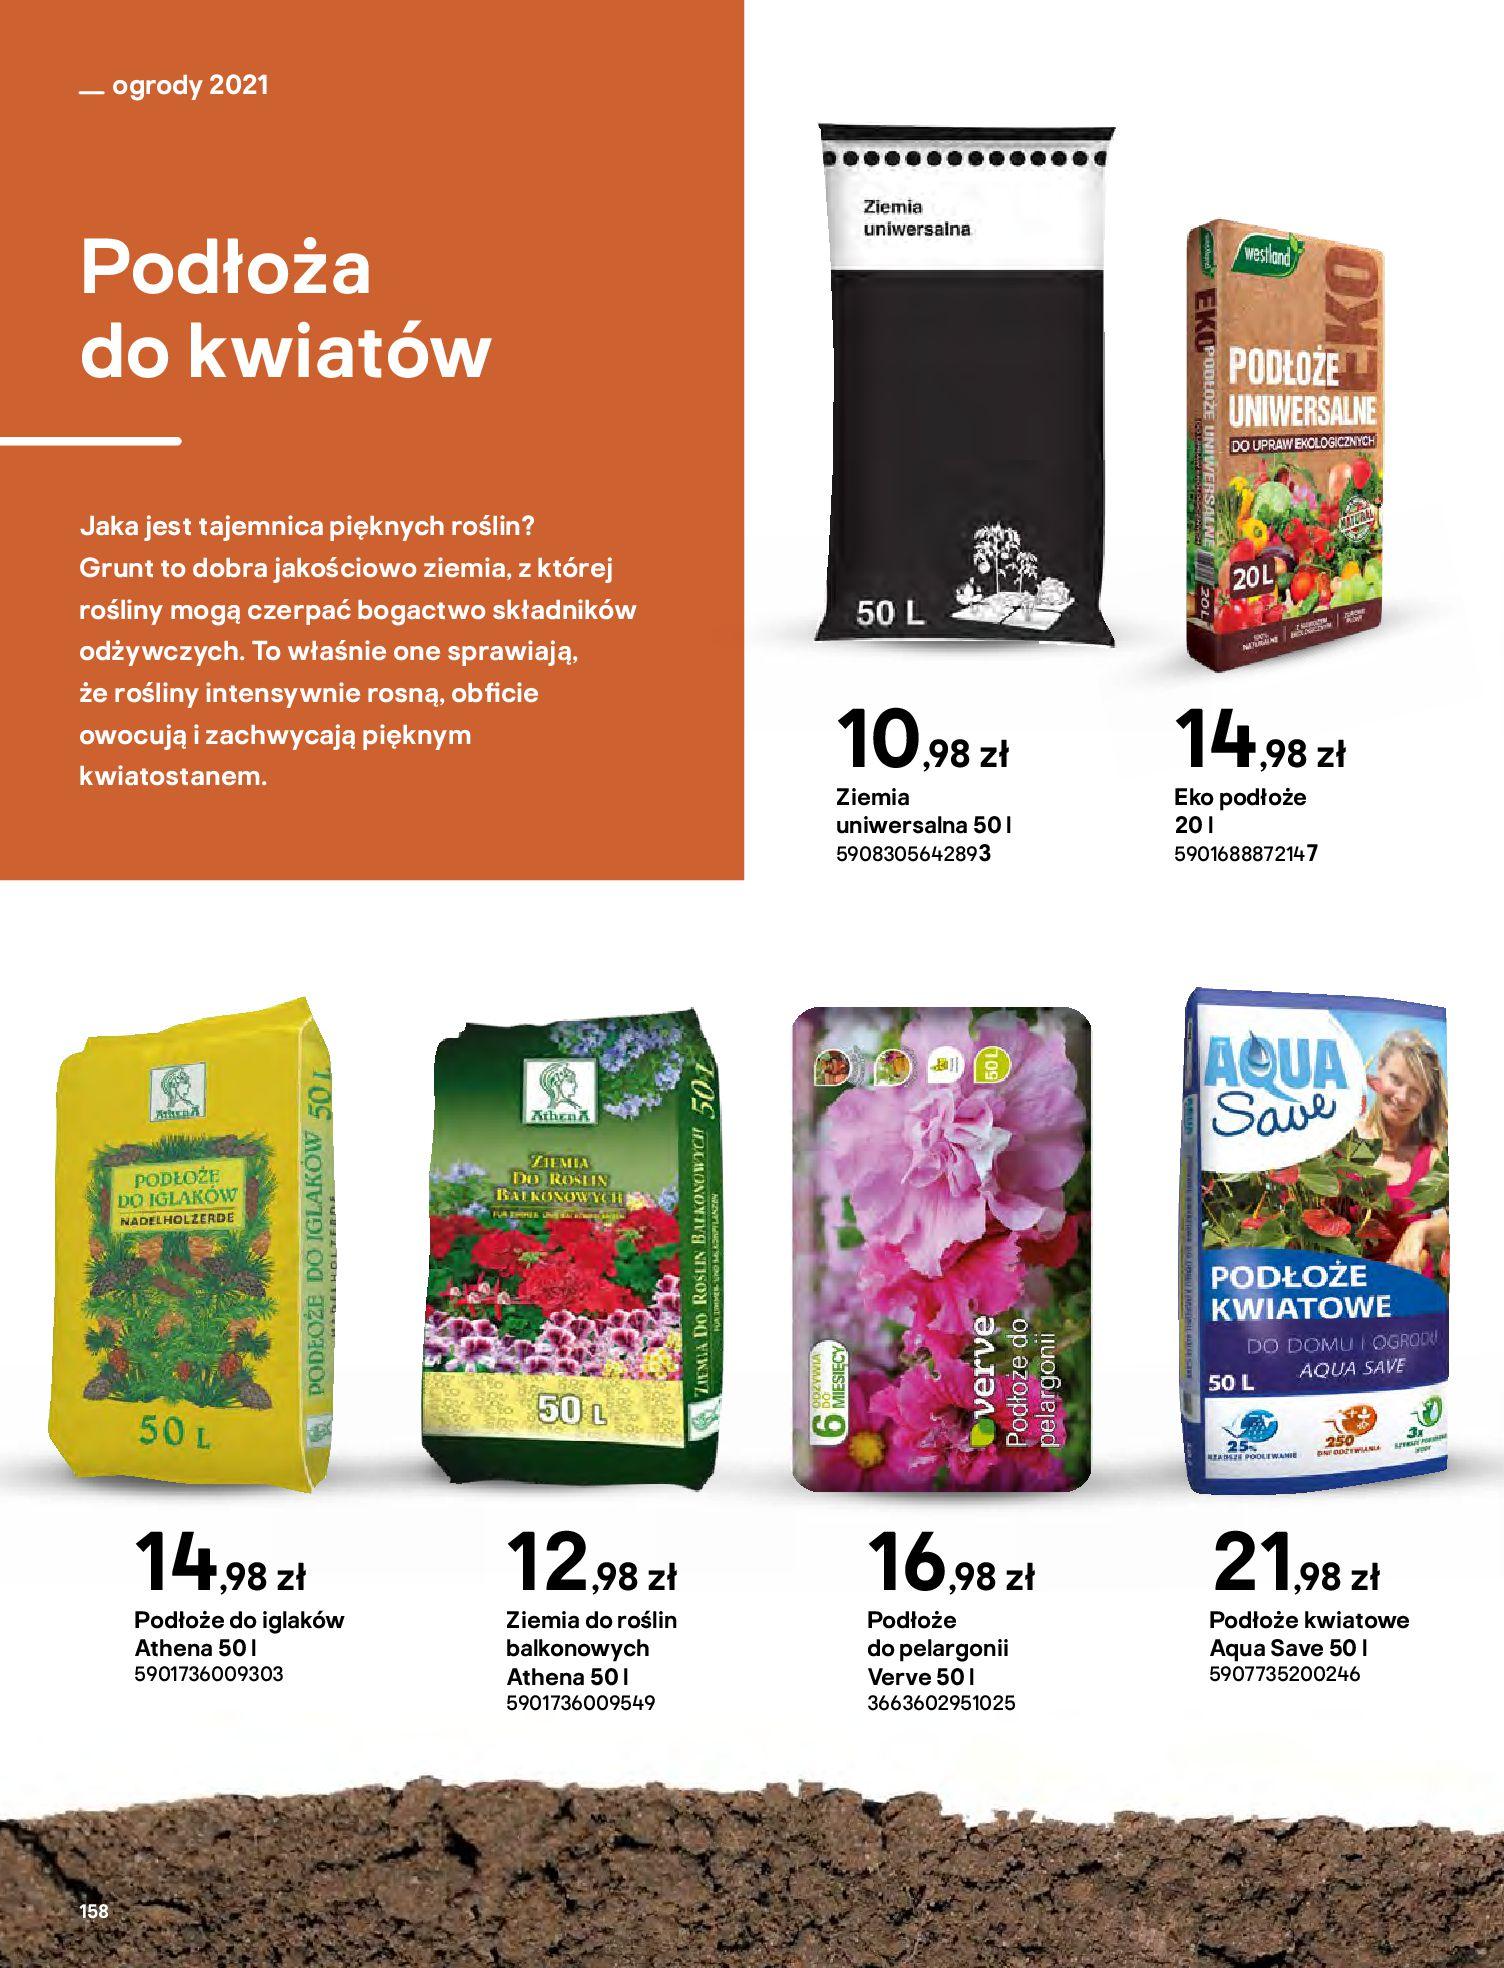 Gazetka Castorama: Katalog ogrody 2021-03-01 page-158